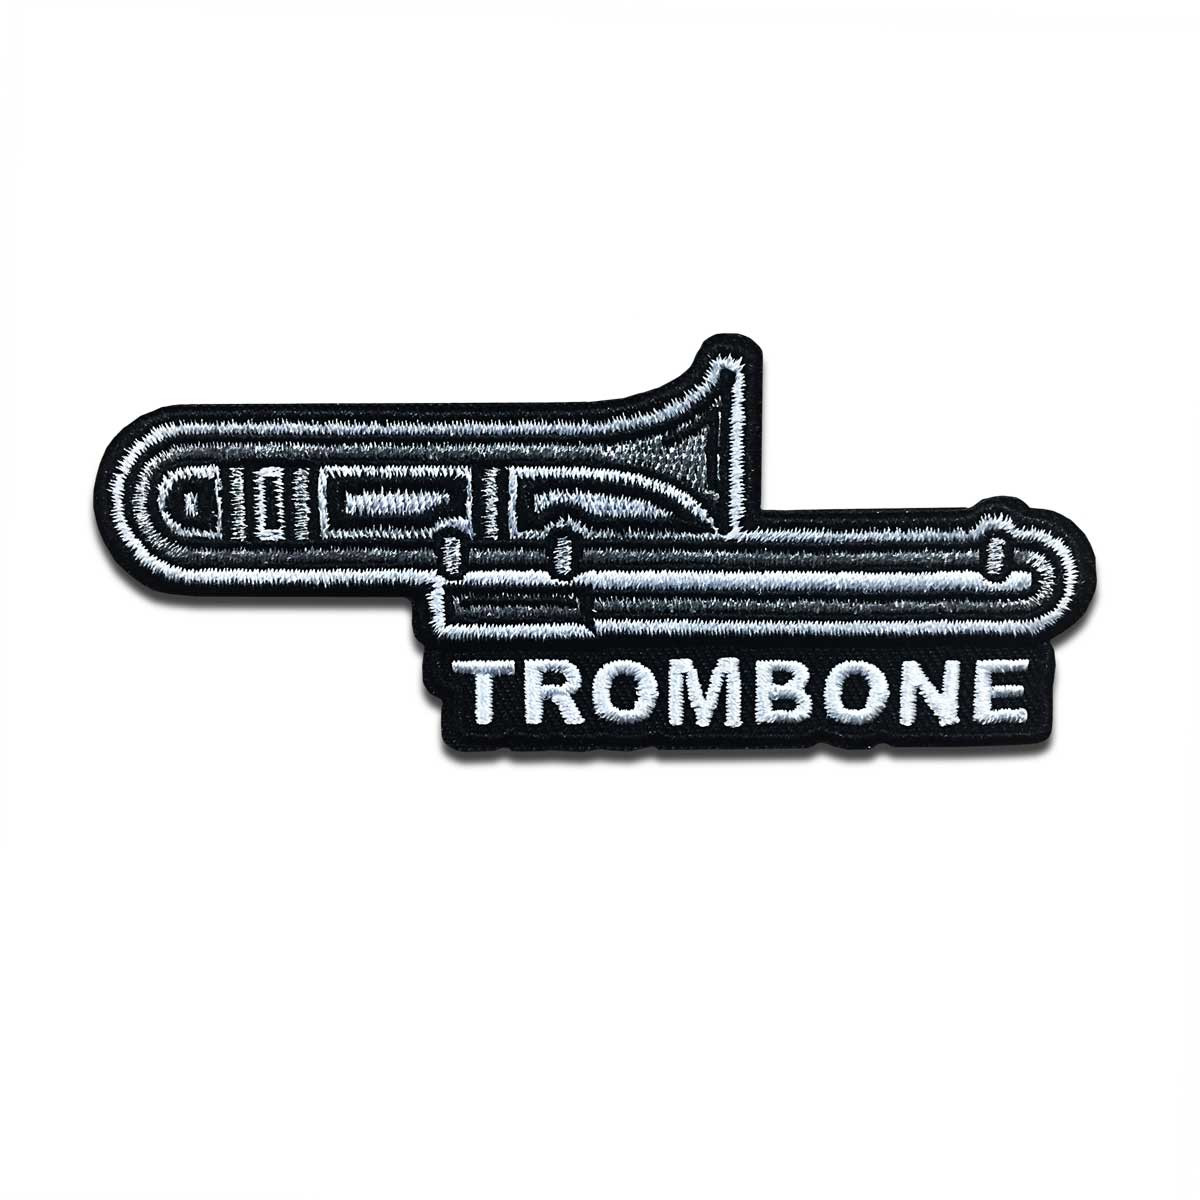 Trombone Instrument Patch